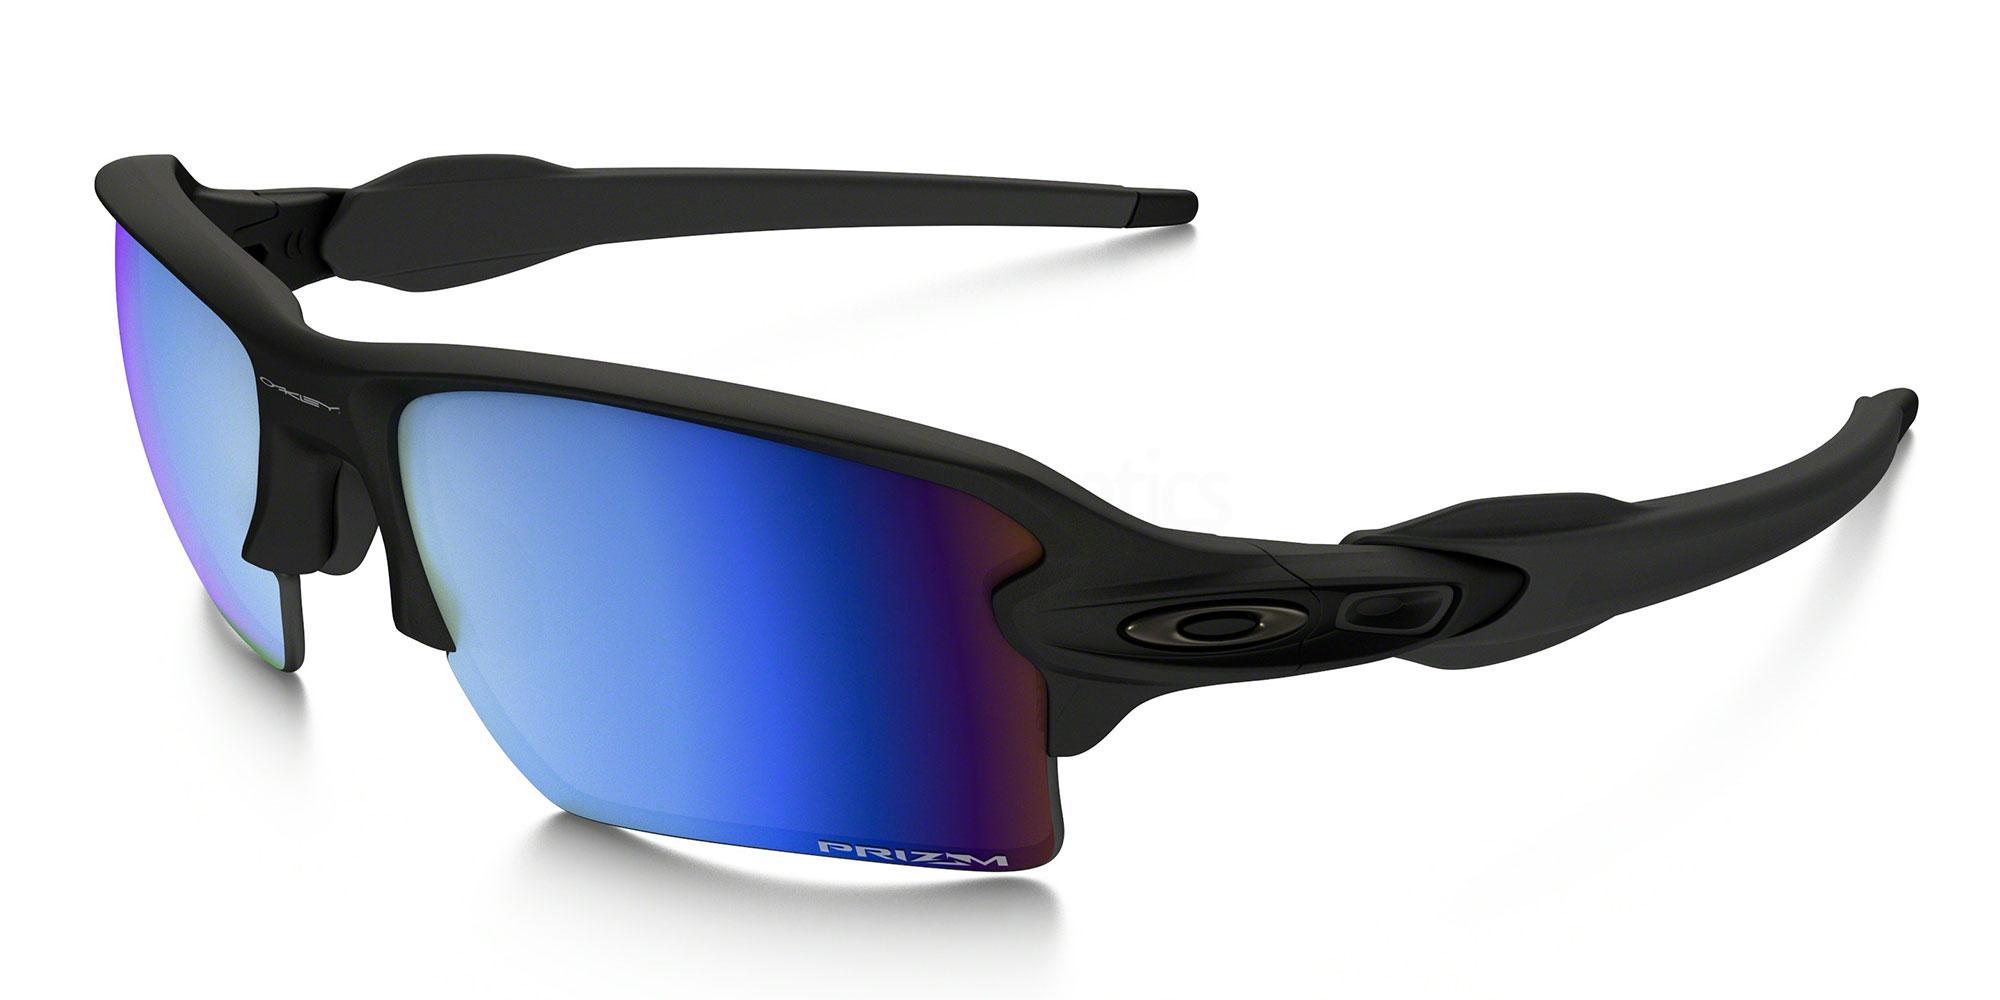 918858 OO9188 POLARIZED FLAK 2.0 XL Sunglasses, Oakley